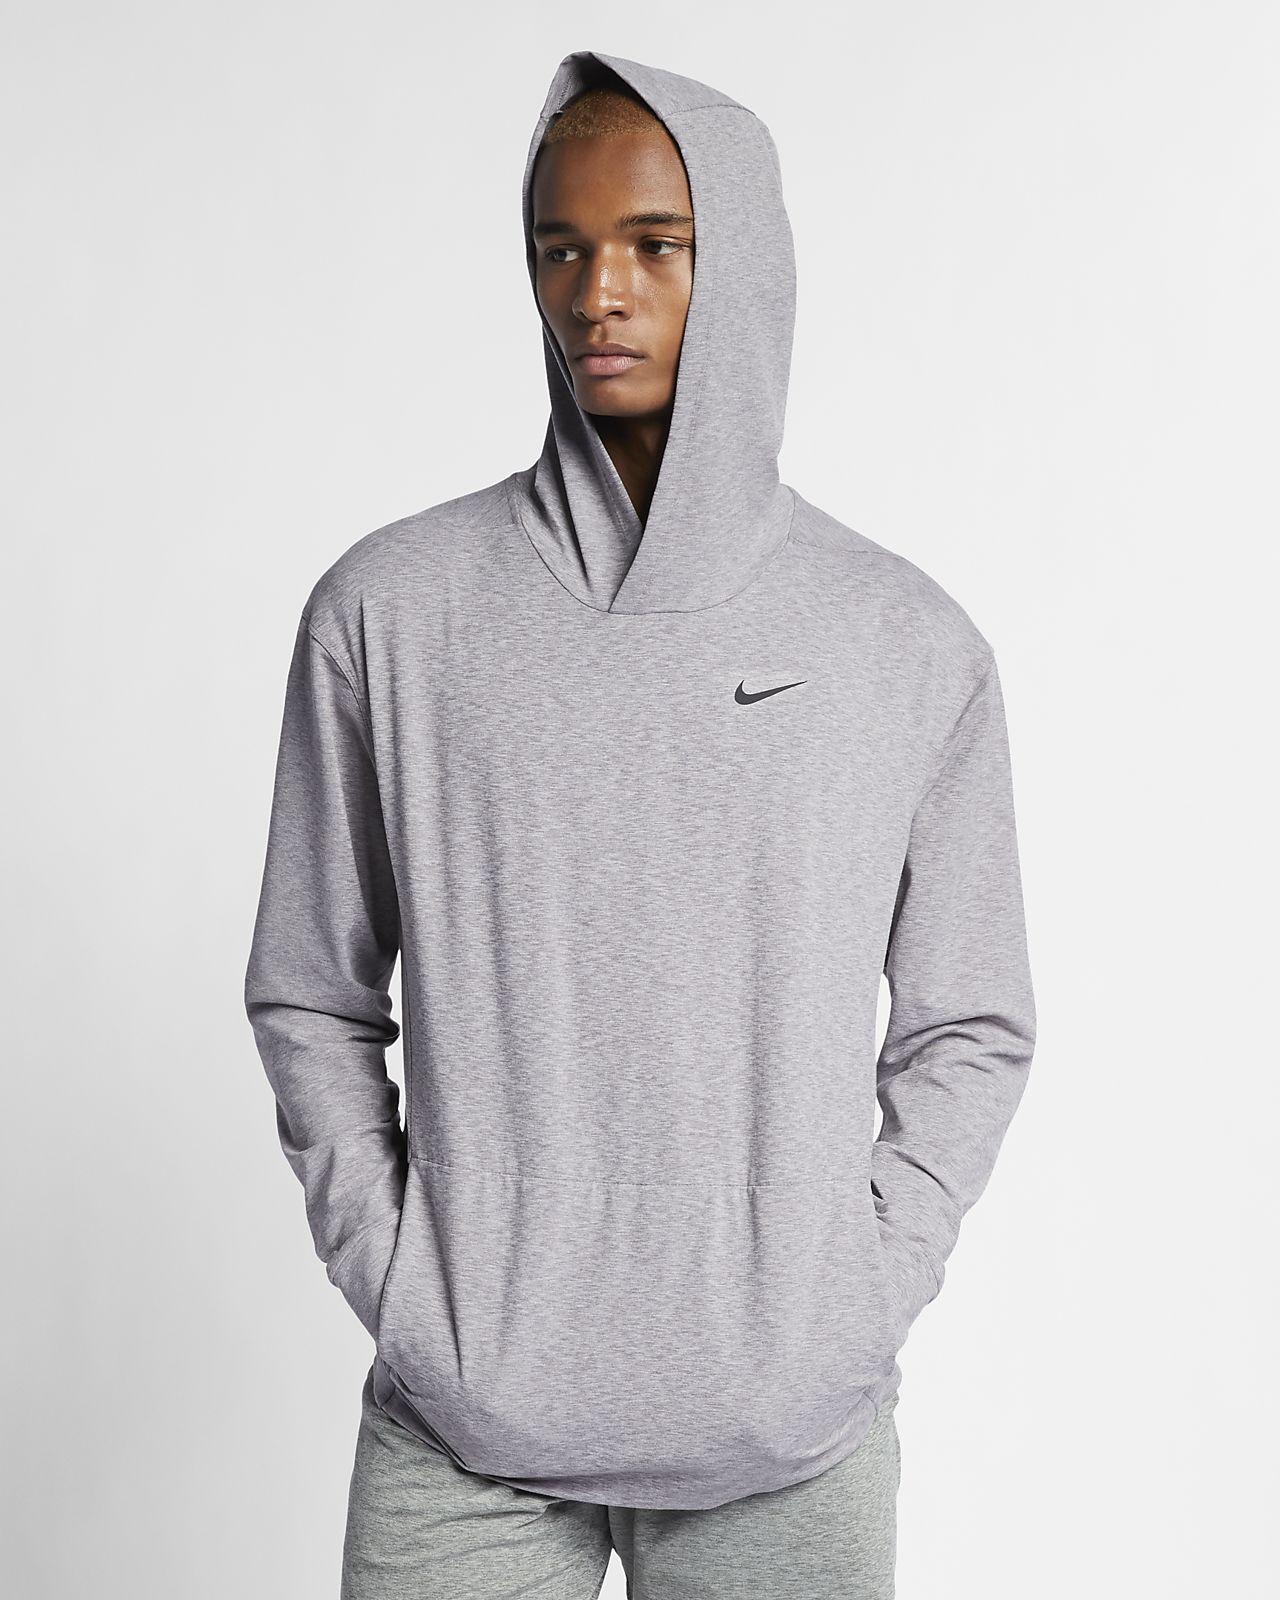 Nike Dri FIT Yogatrainingshoodie met lange mouwen voor heren